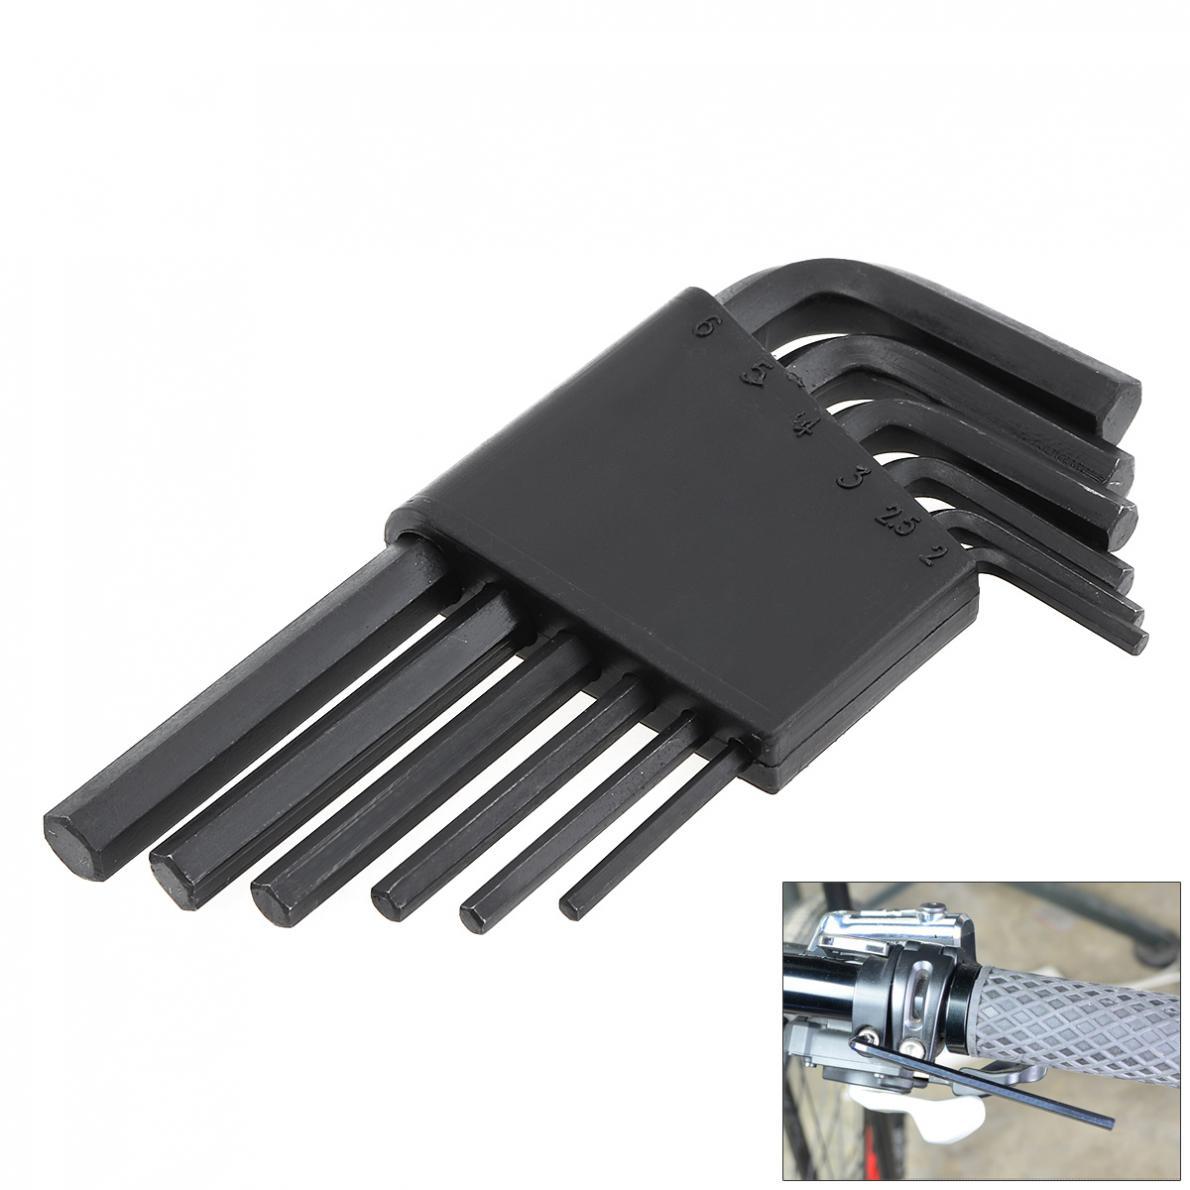 Hex Allen Key Kit Wrench Set Steel Spanner Black Bike Reparing Tool Set